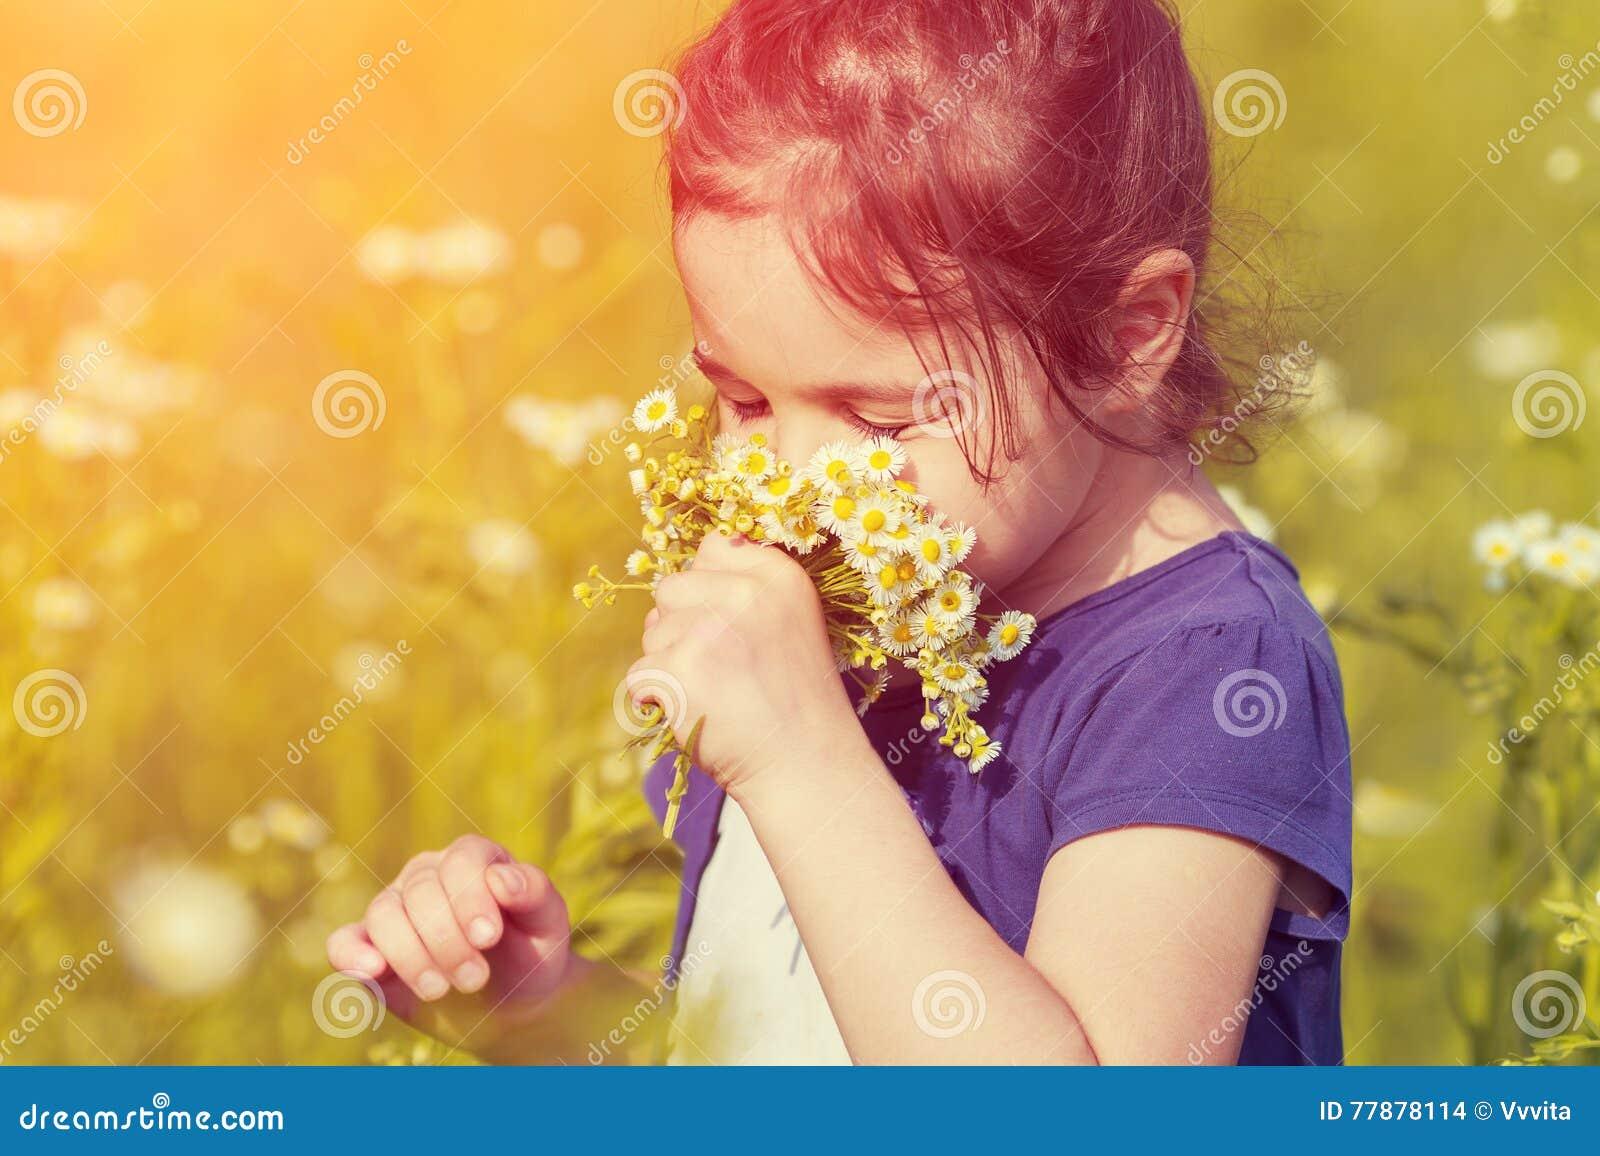 La Niña Huele Las Flores Foto de archivo